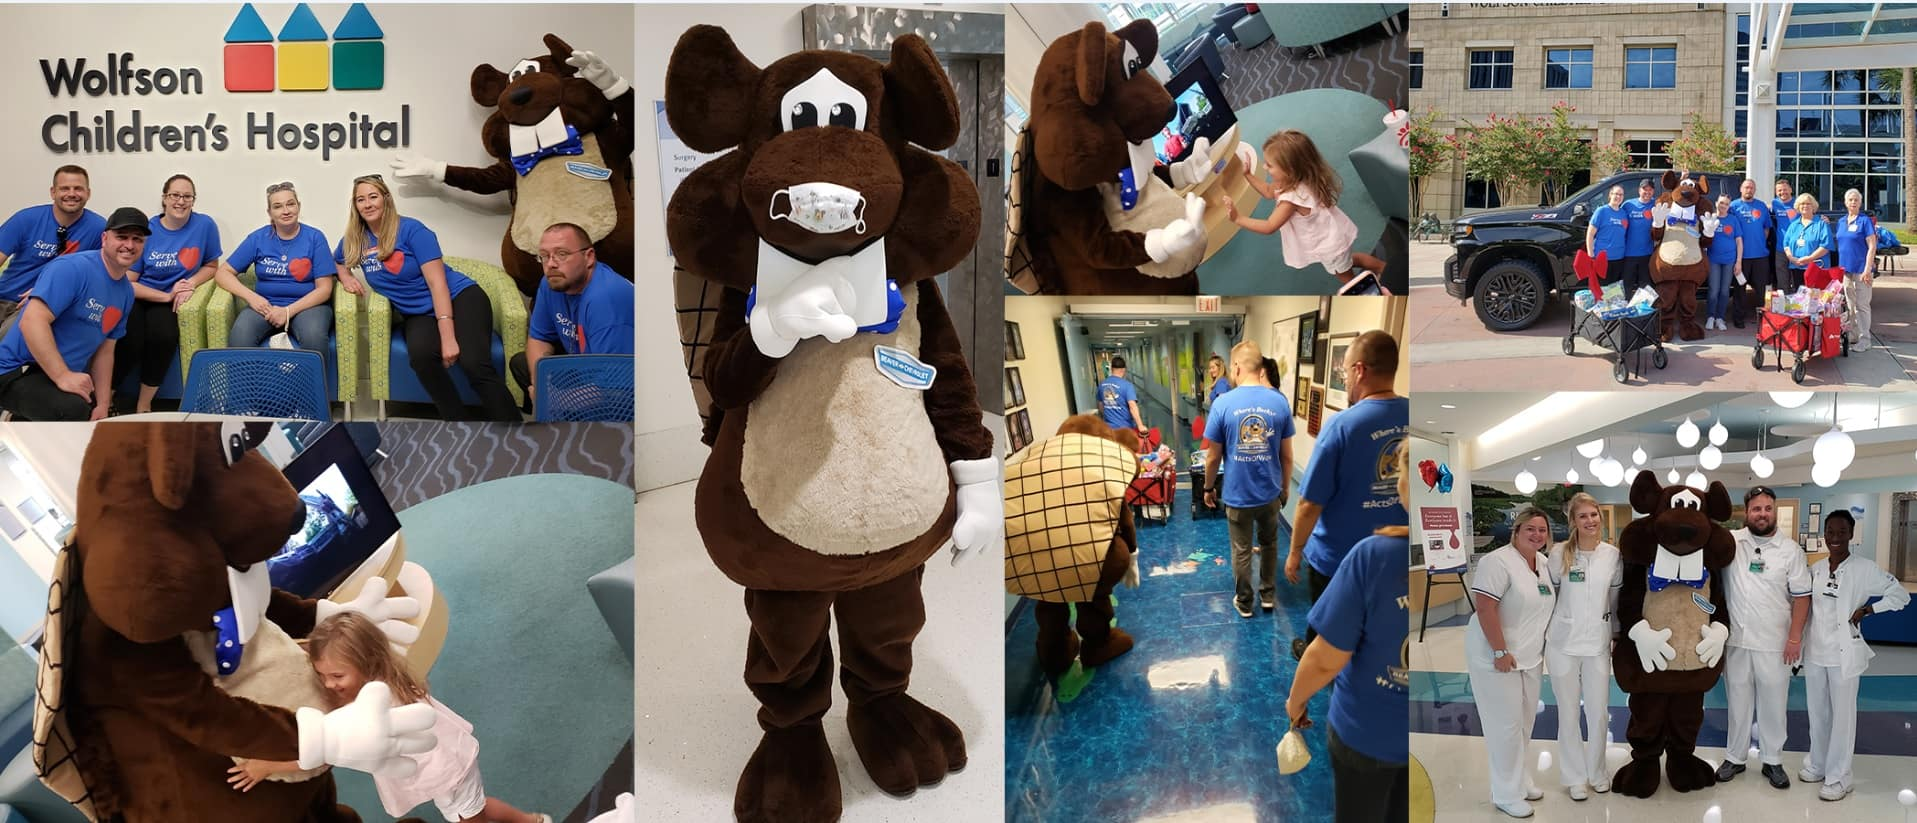 Random Acts of Wow Beaver Chevrolet  Wolfson Children's Hospital